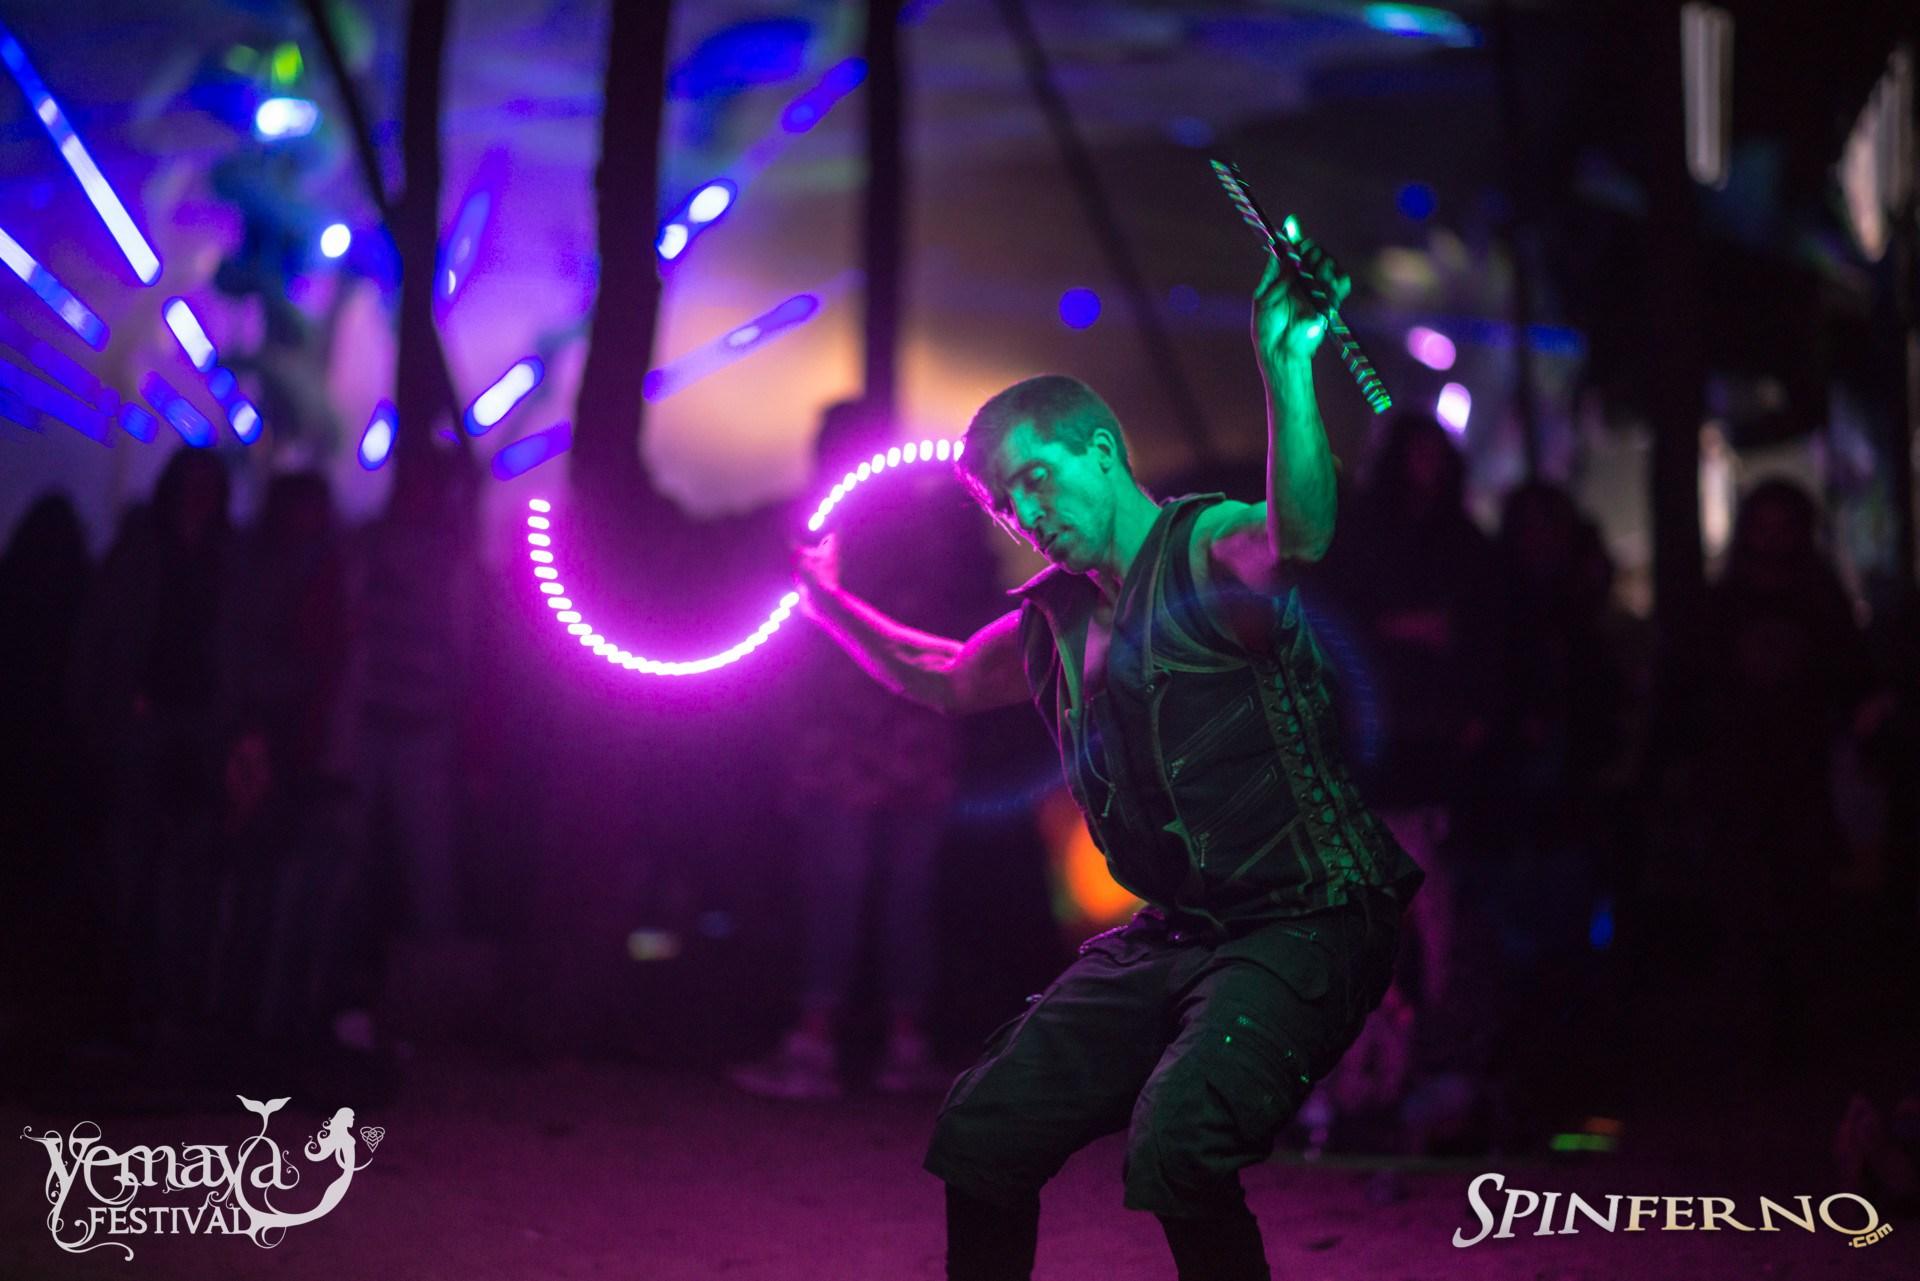 Spinferno - Dan LED Buugeng